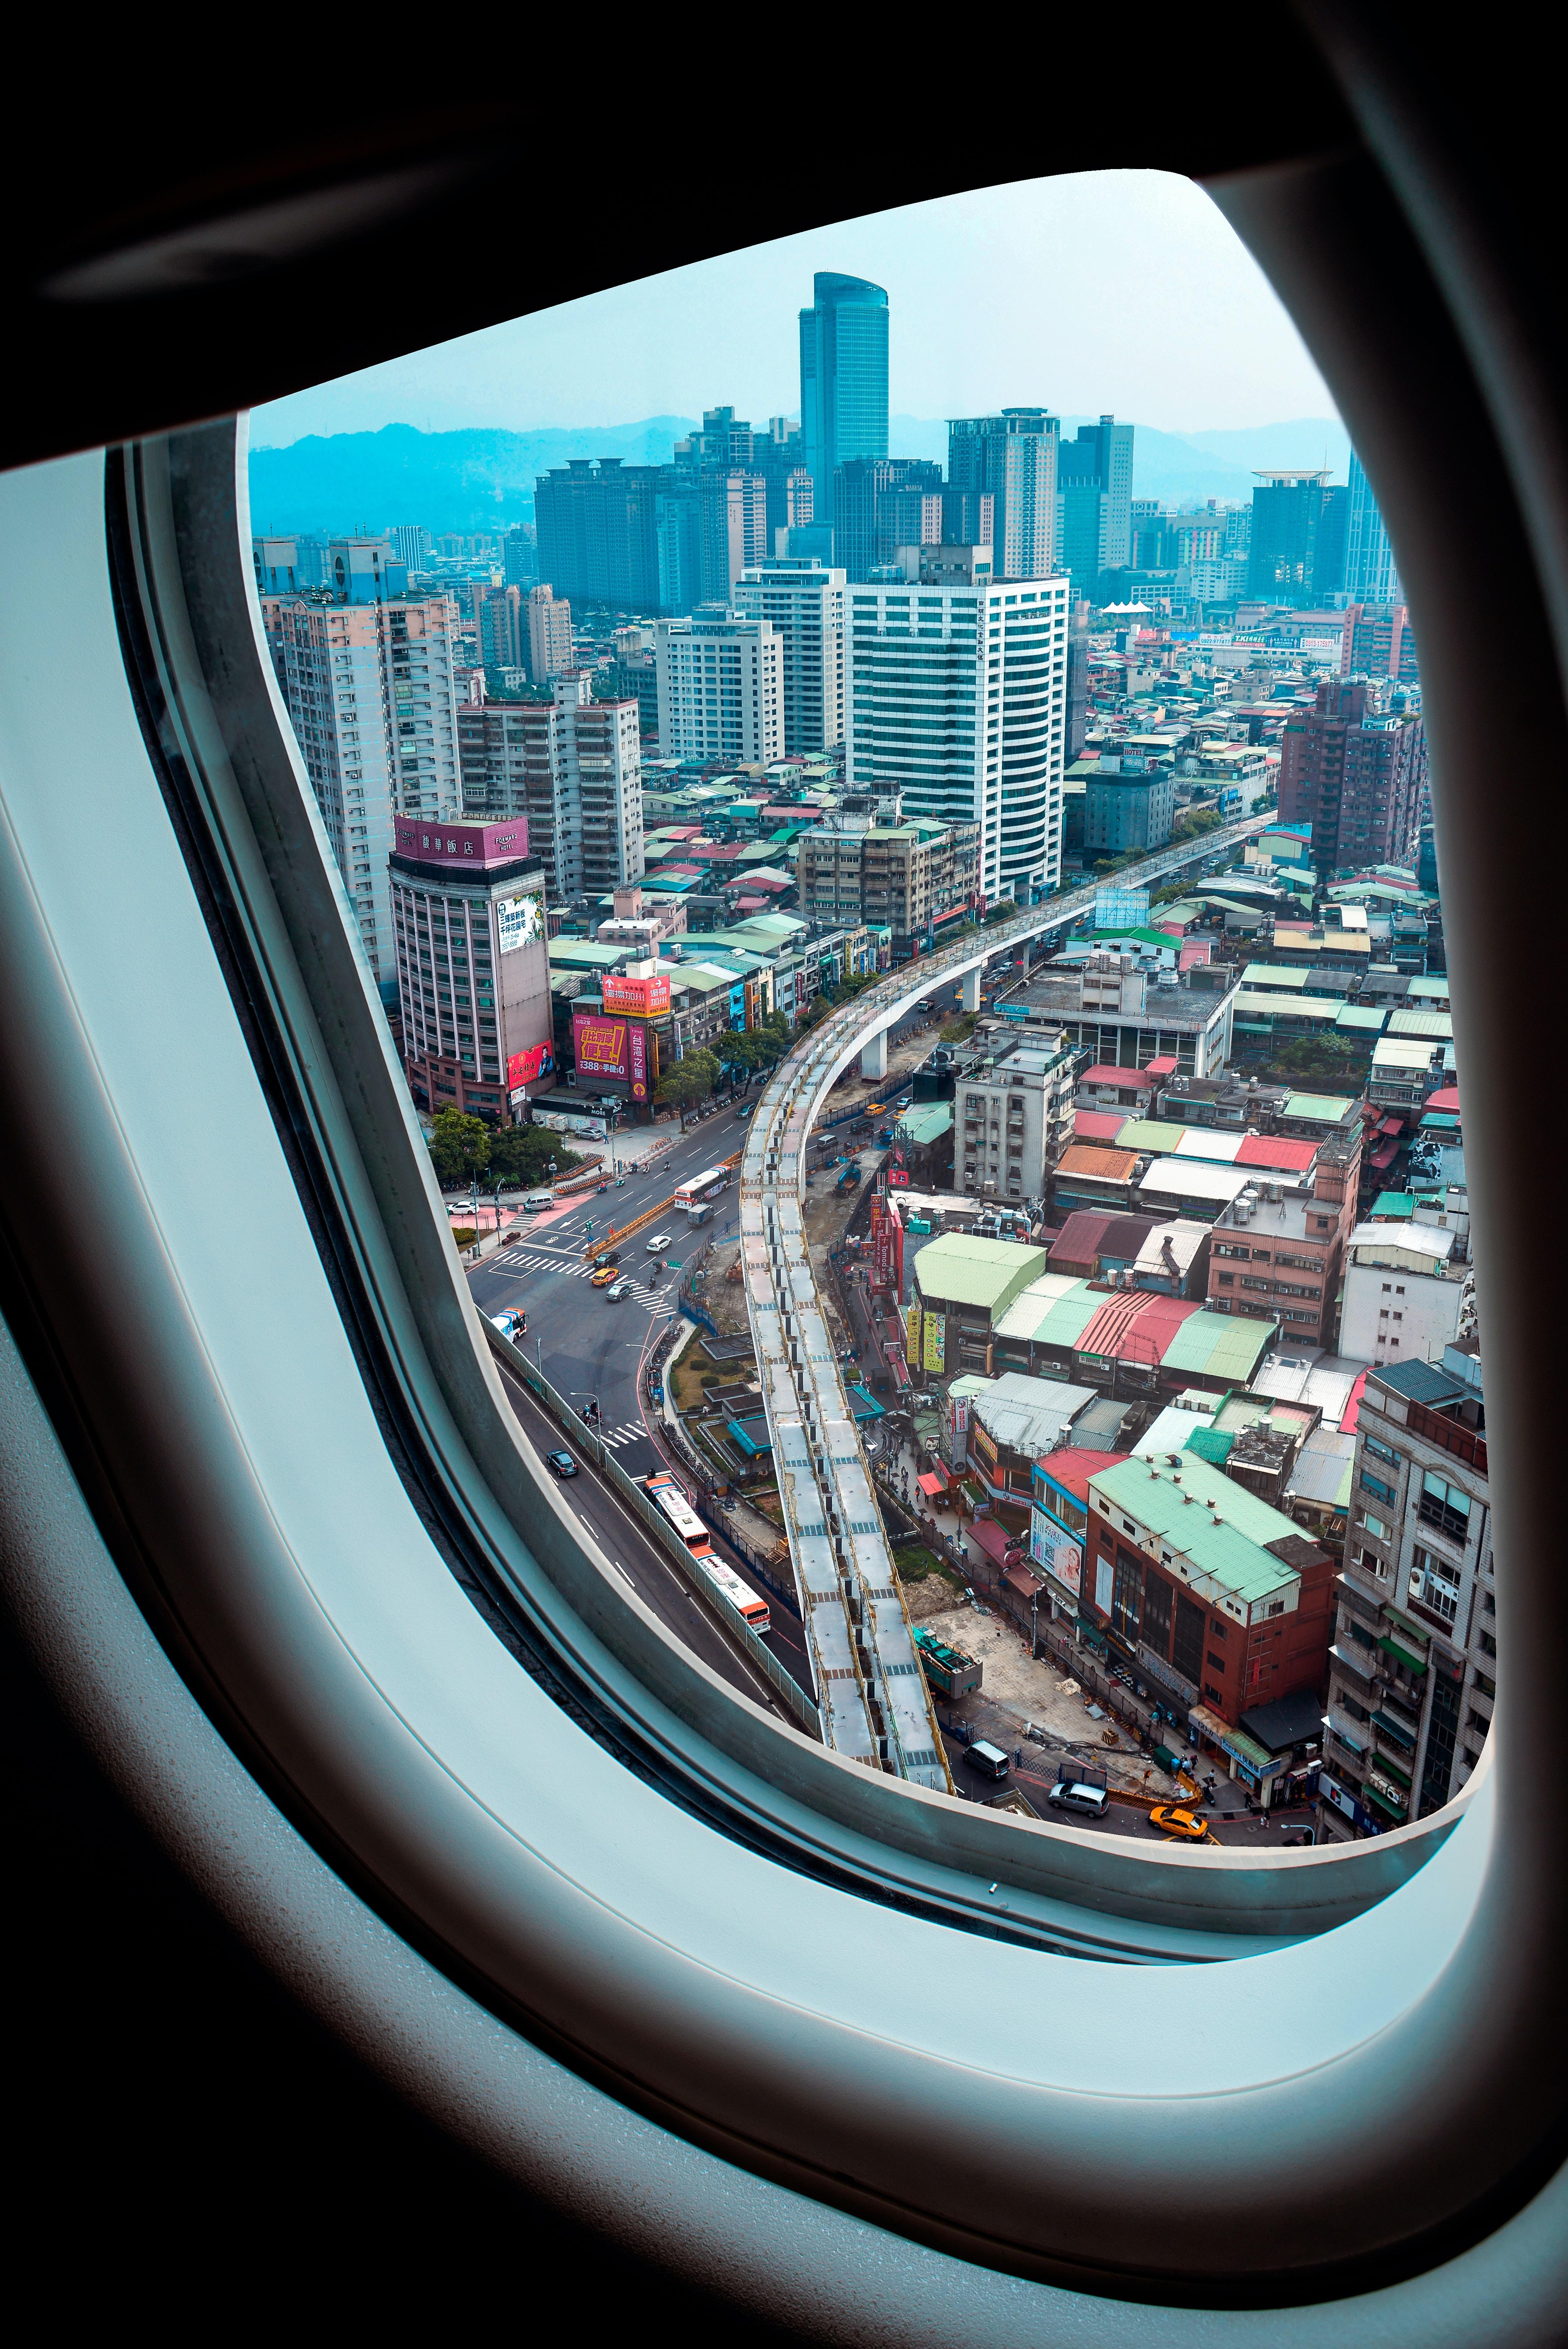 airplane window view of skyscraper